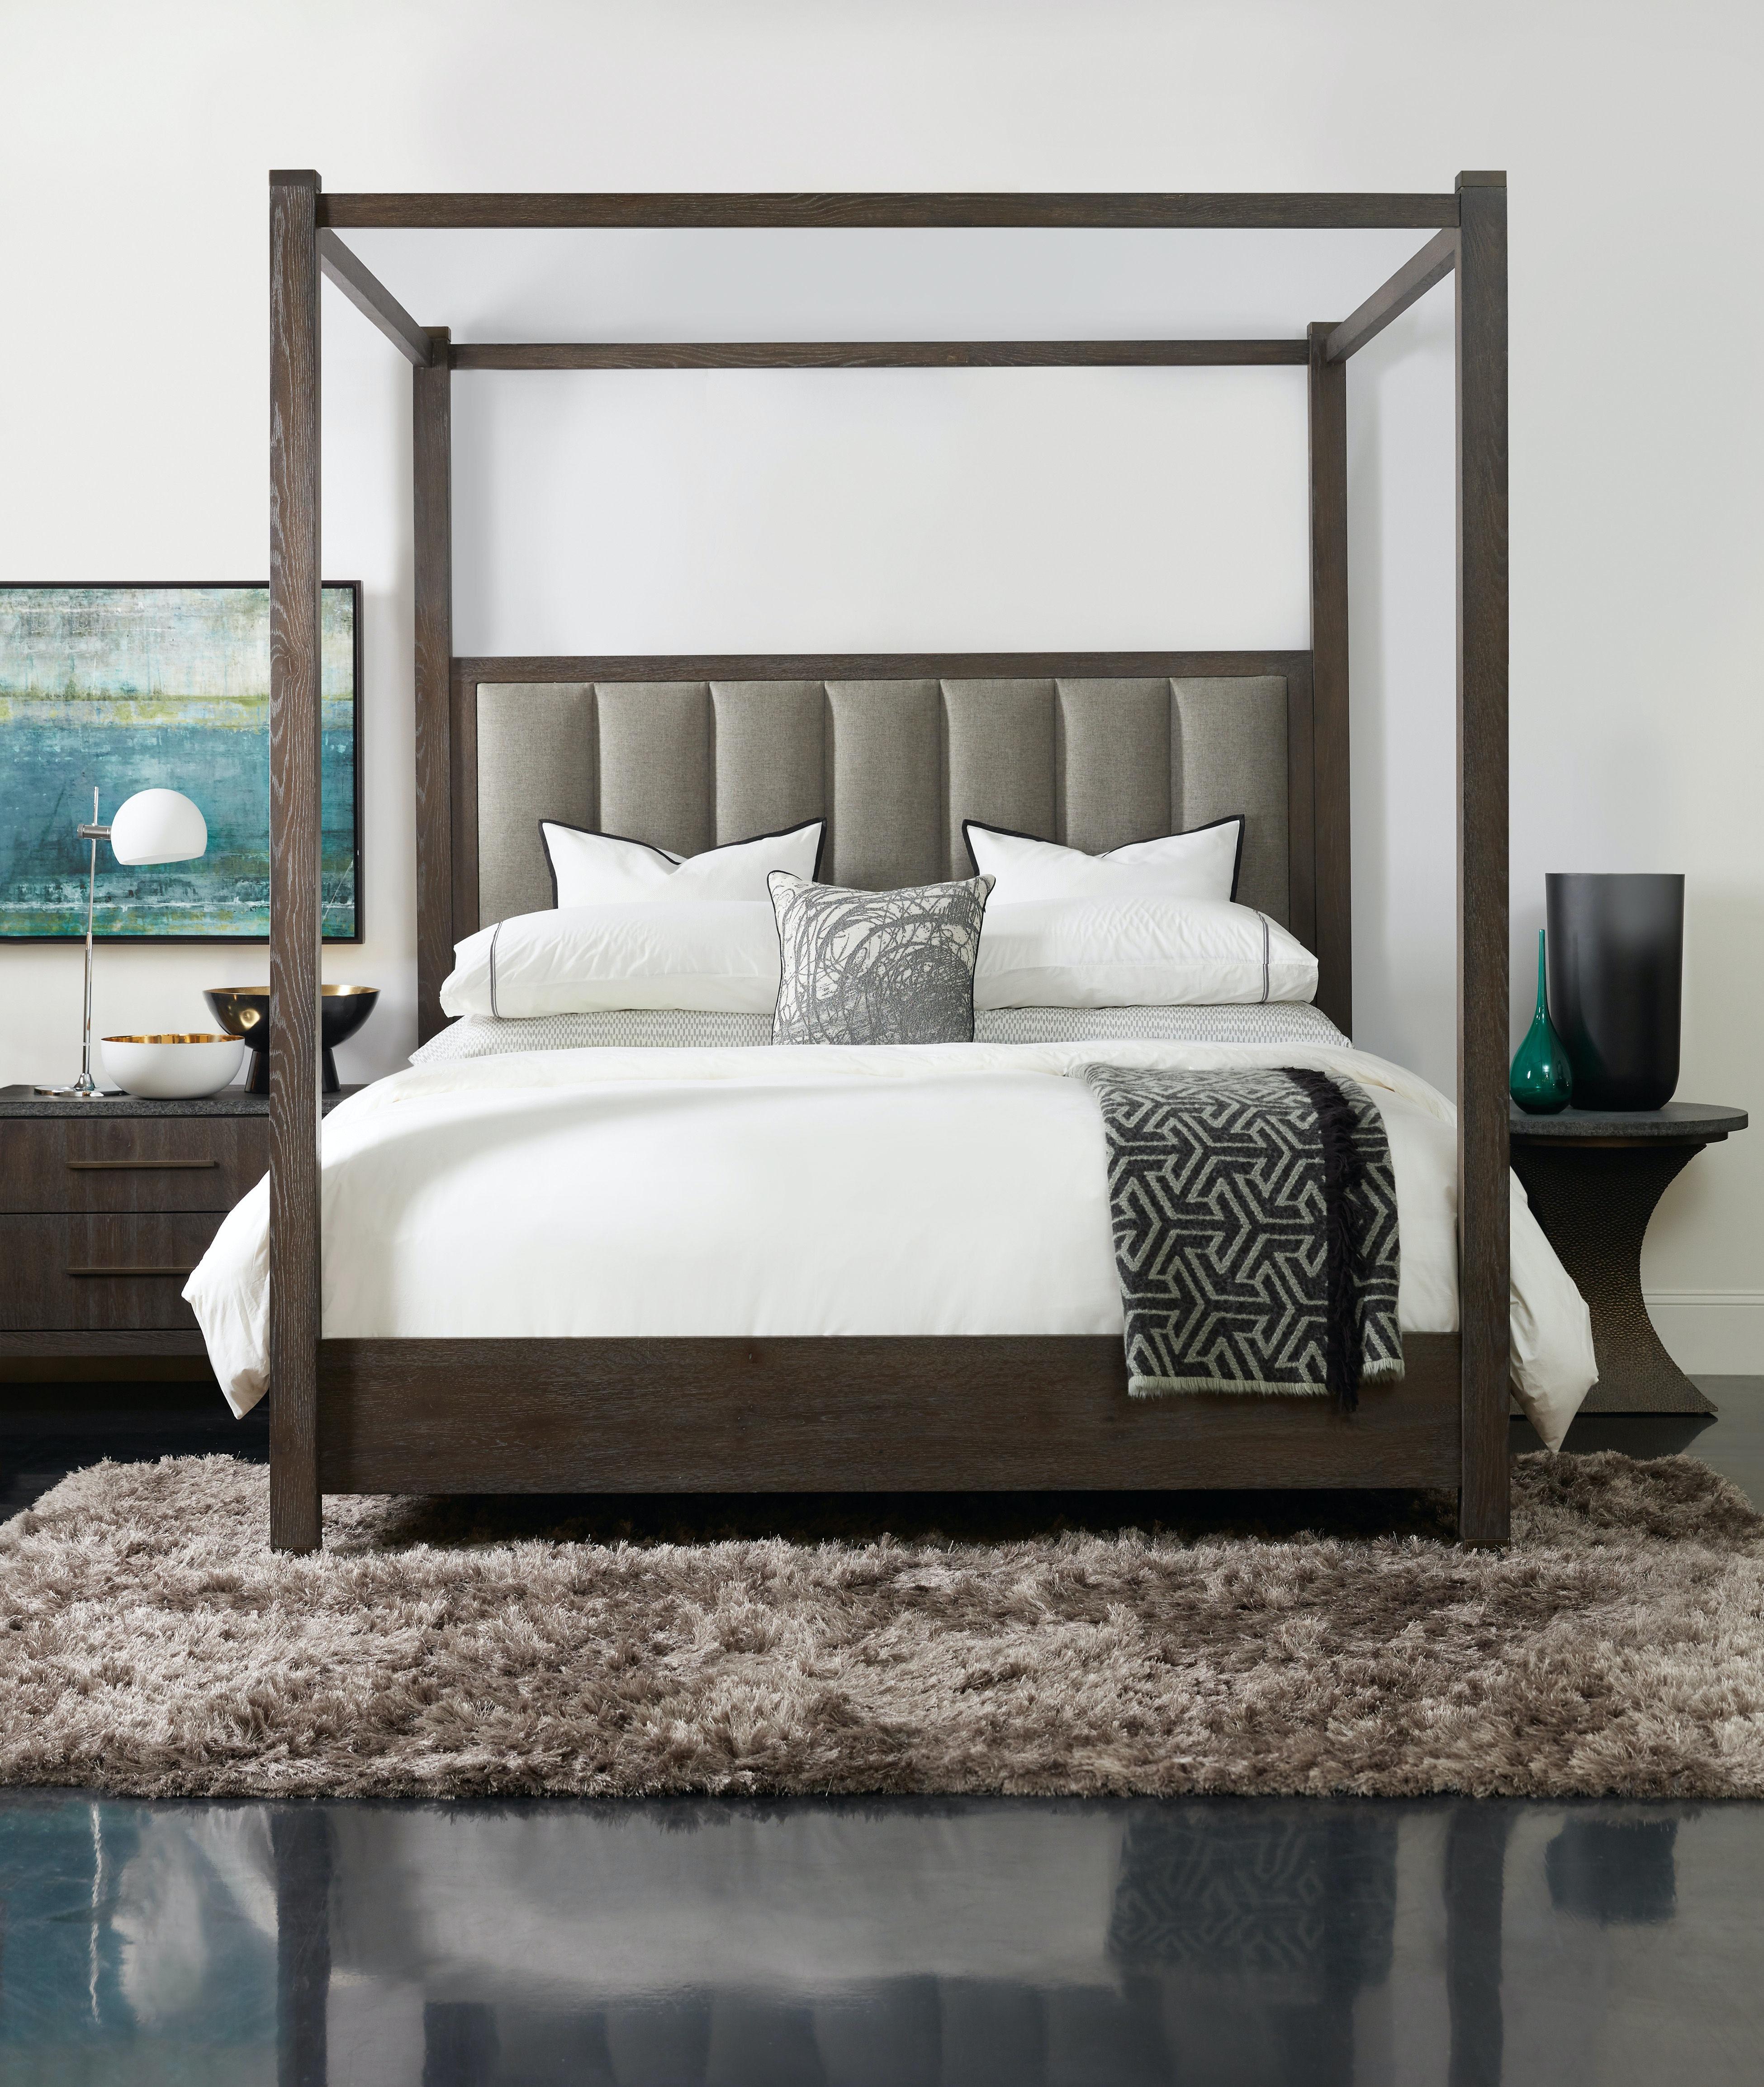 High Quality Hooker Furniture Miramar Aventura Jackson Queen Poster Bed W Tall Posts U0026  Canopy 6202